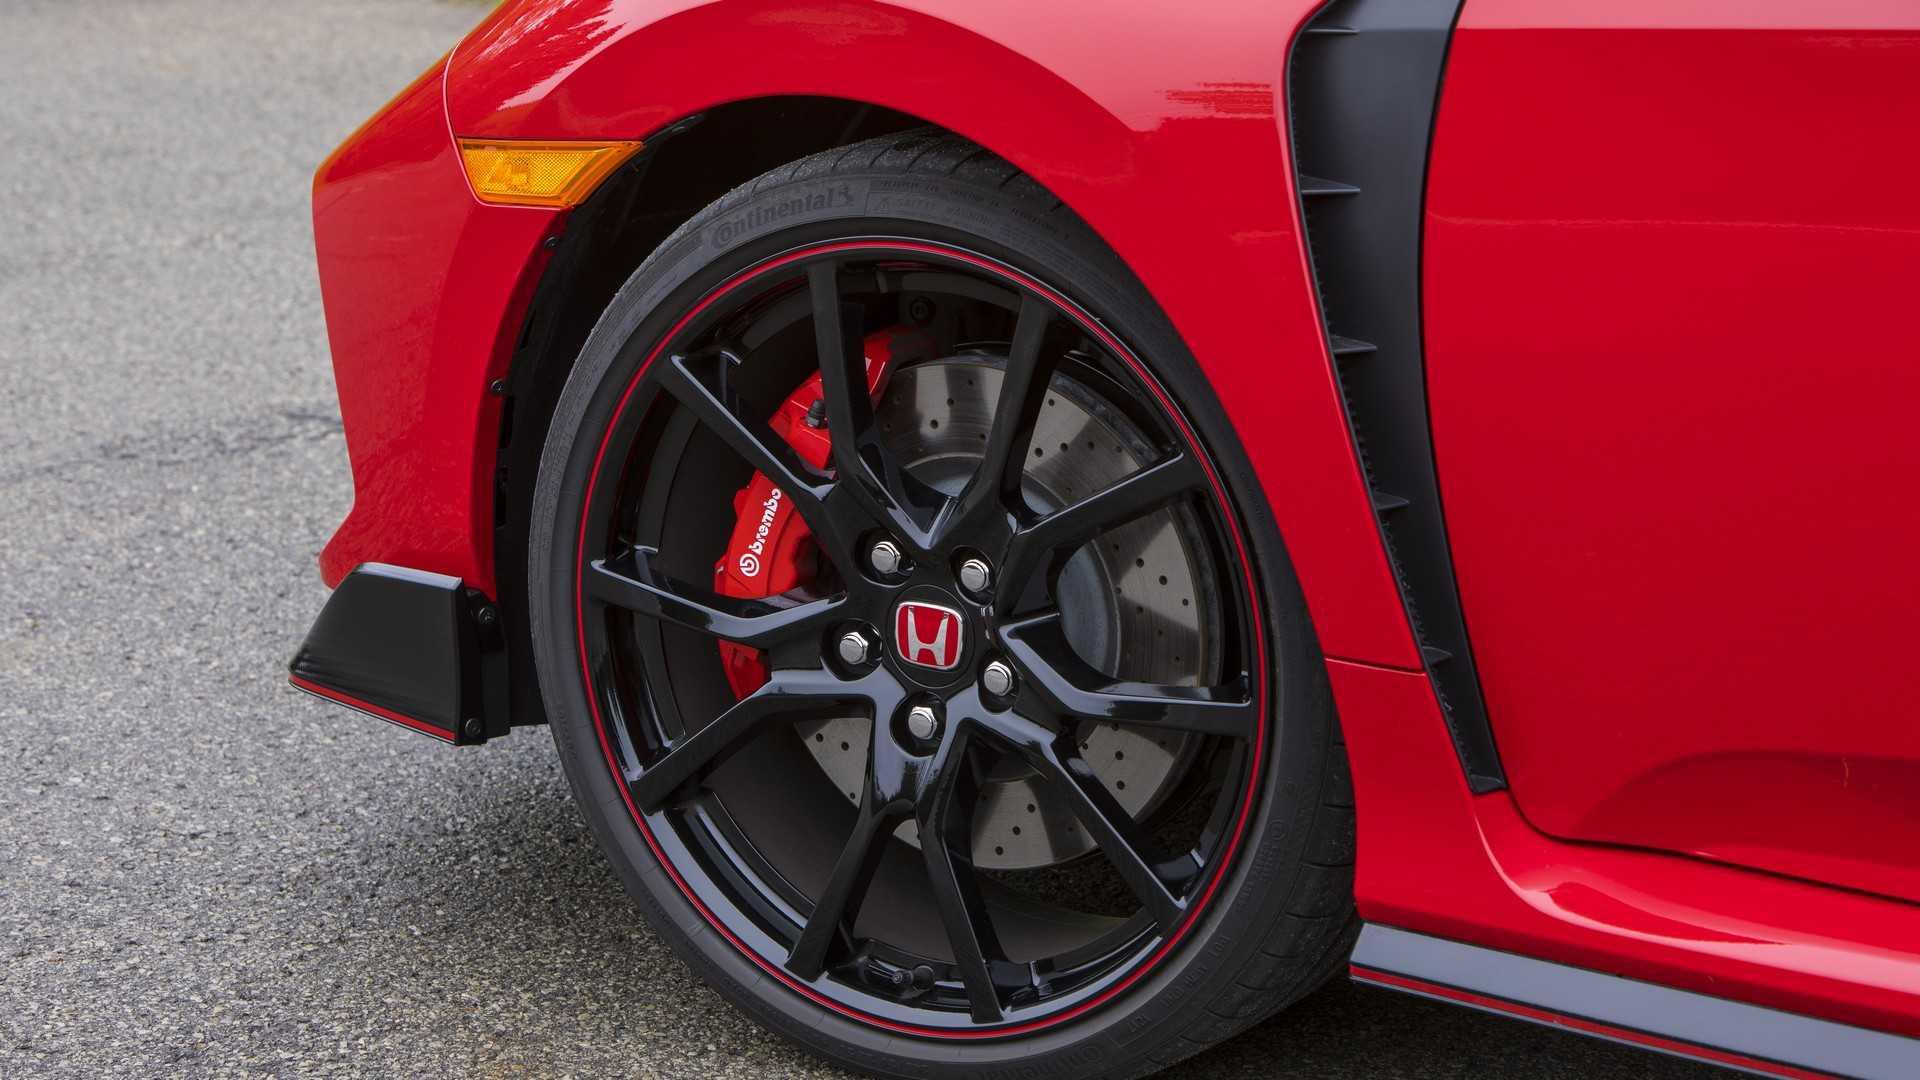 2019 Honda Civic Type R (Color: Rallye Red) Wheel Wallpapers